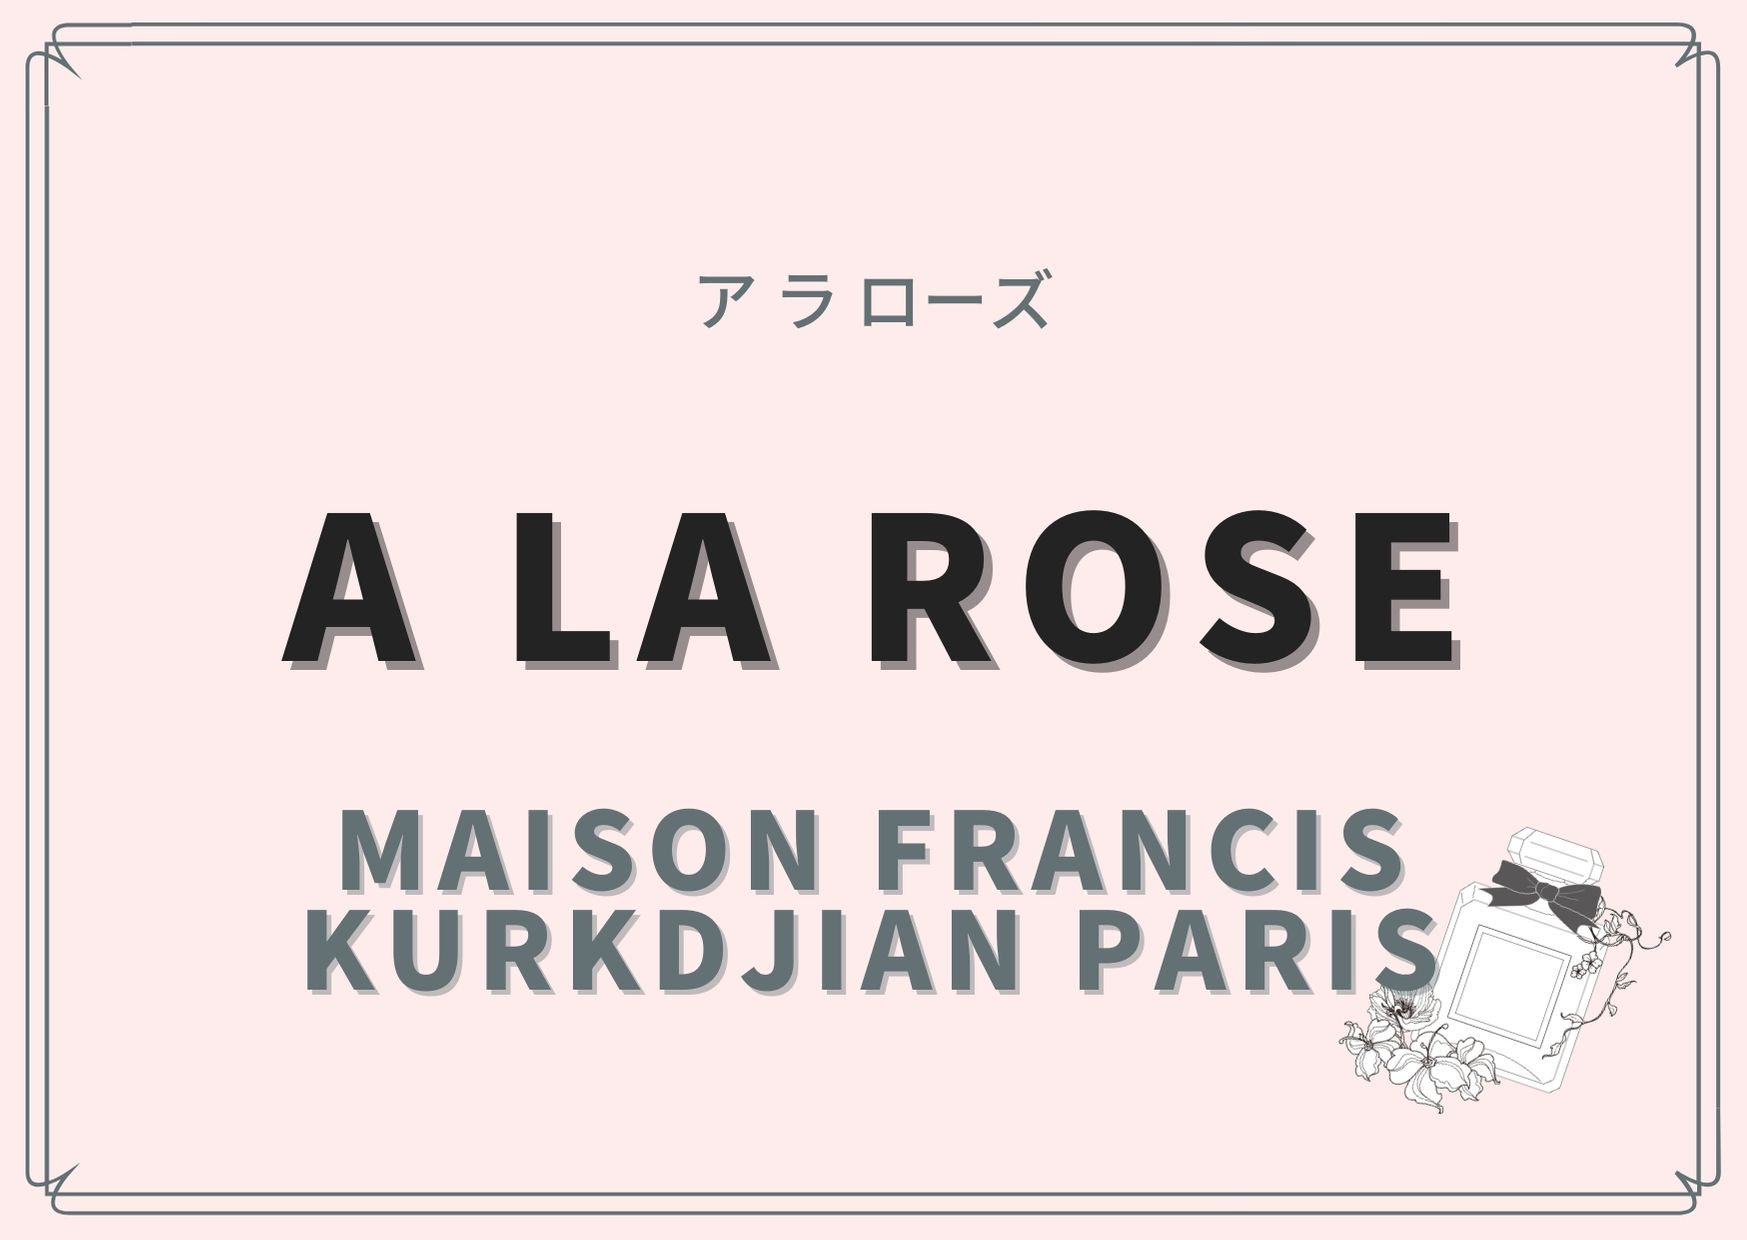 A LA ROSE(ア ラ ローズ) / Maison Francis Kurkdjian Paris(メゾン フランシス クルジャン)